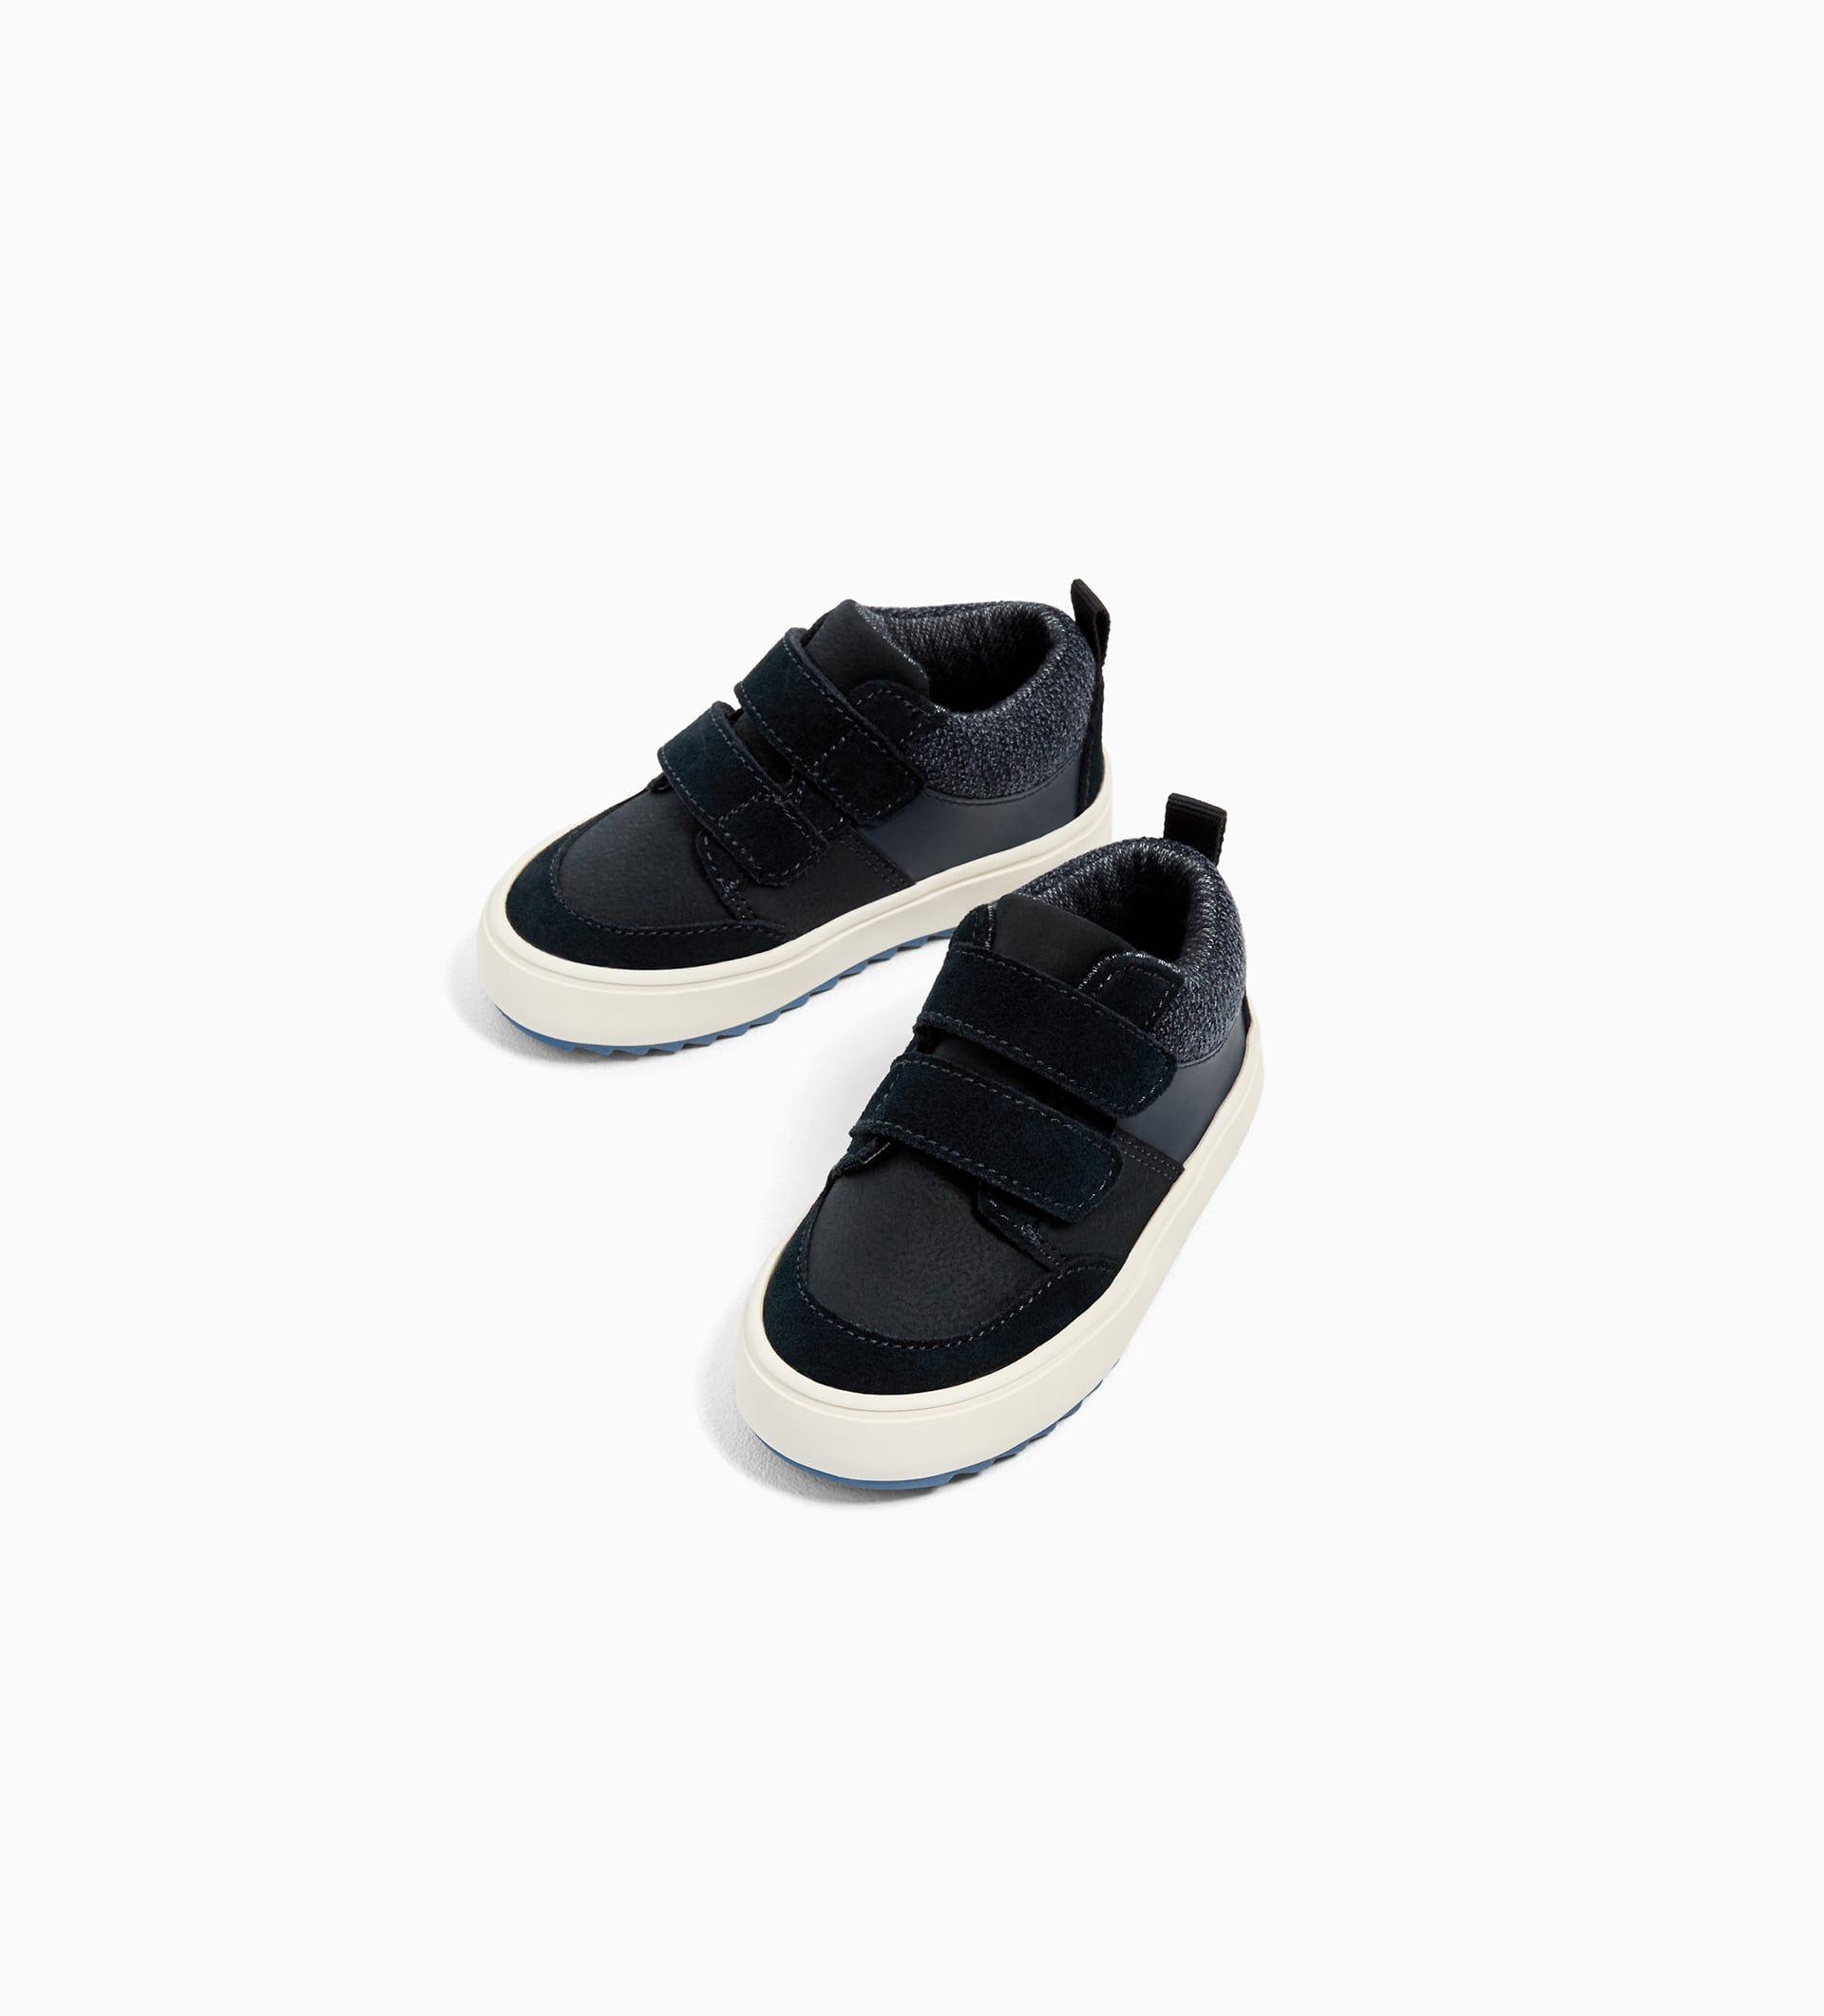 Sportowe Buty Dzieciece Mlodziezowe Czarne Abckids B012310074 All Black Sneakers Shoes Puma Sneaker